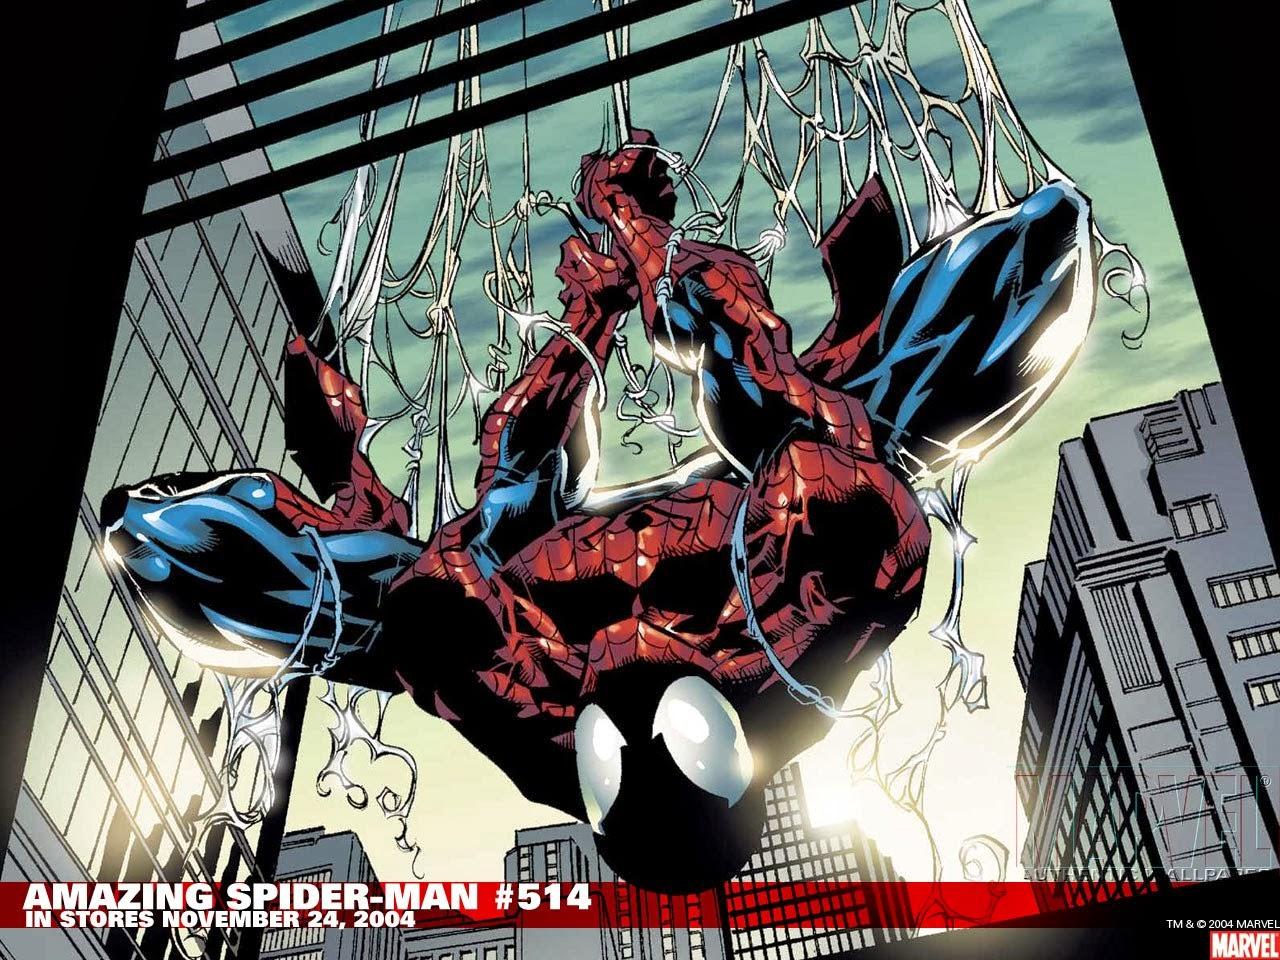 Fondos De Pantalla Gratis San Valentin 16: Fondo De Pantalla Marvel Amazing Spider-man